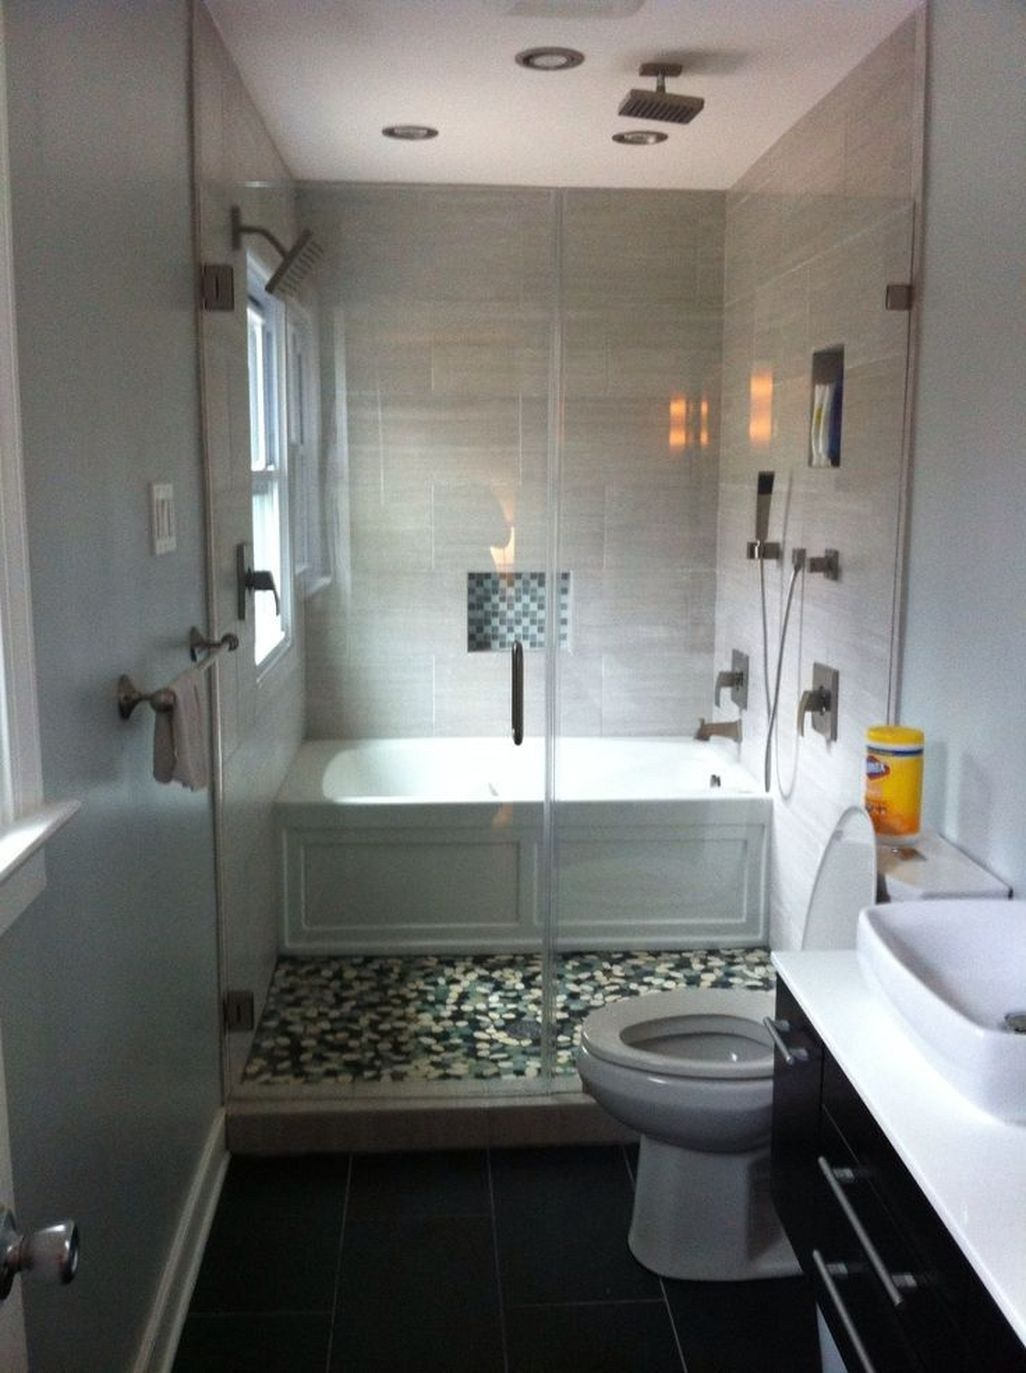 Cool Small Master Bathroom Renovation Ideas 28 Smallbathroomrenovations Small Narrow Bathroom Small Bathroom Layout Bathtubs For Small Bathrooms